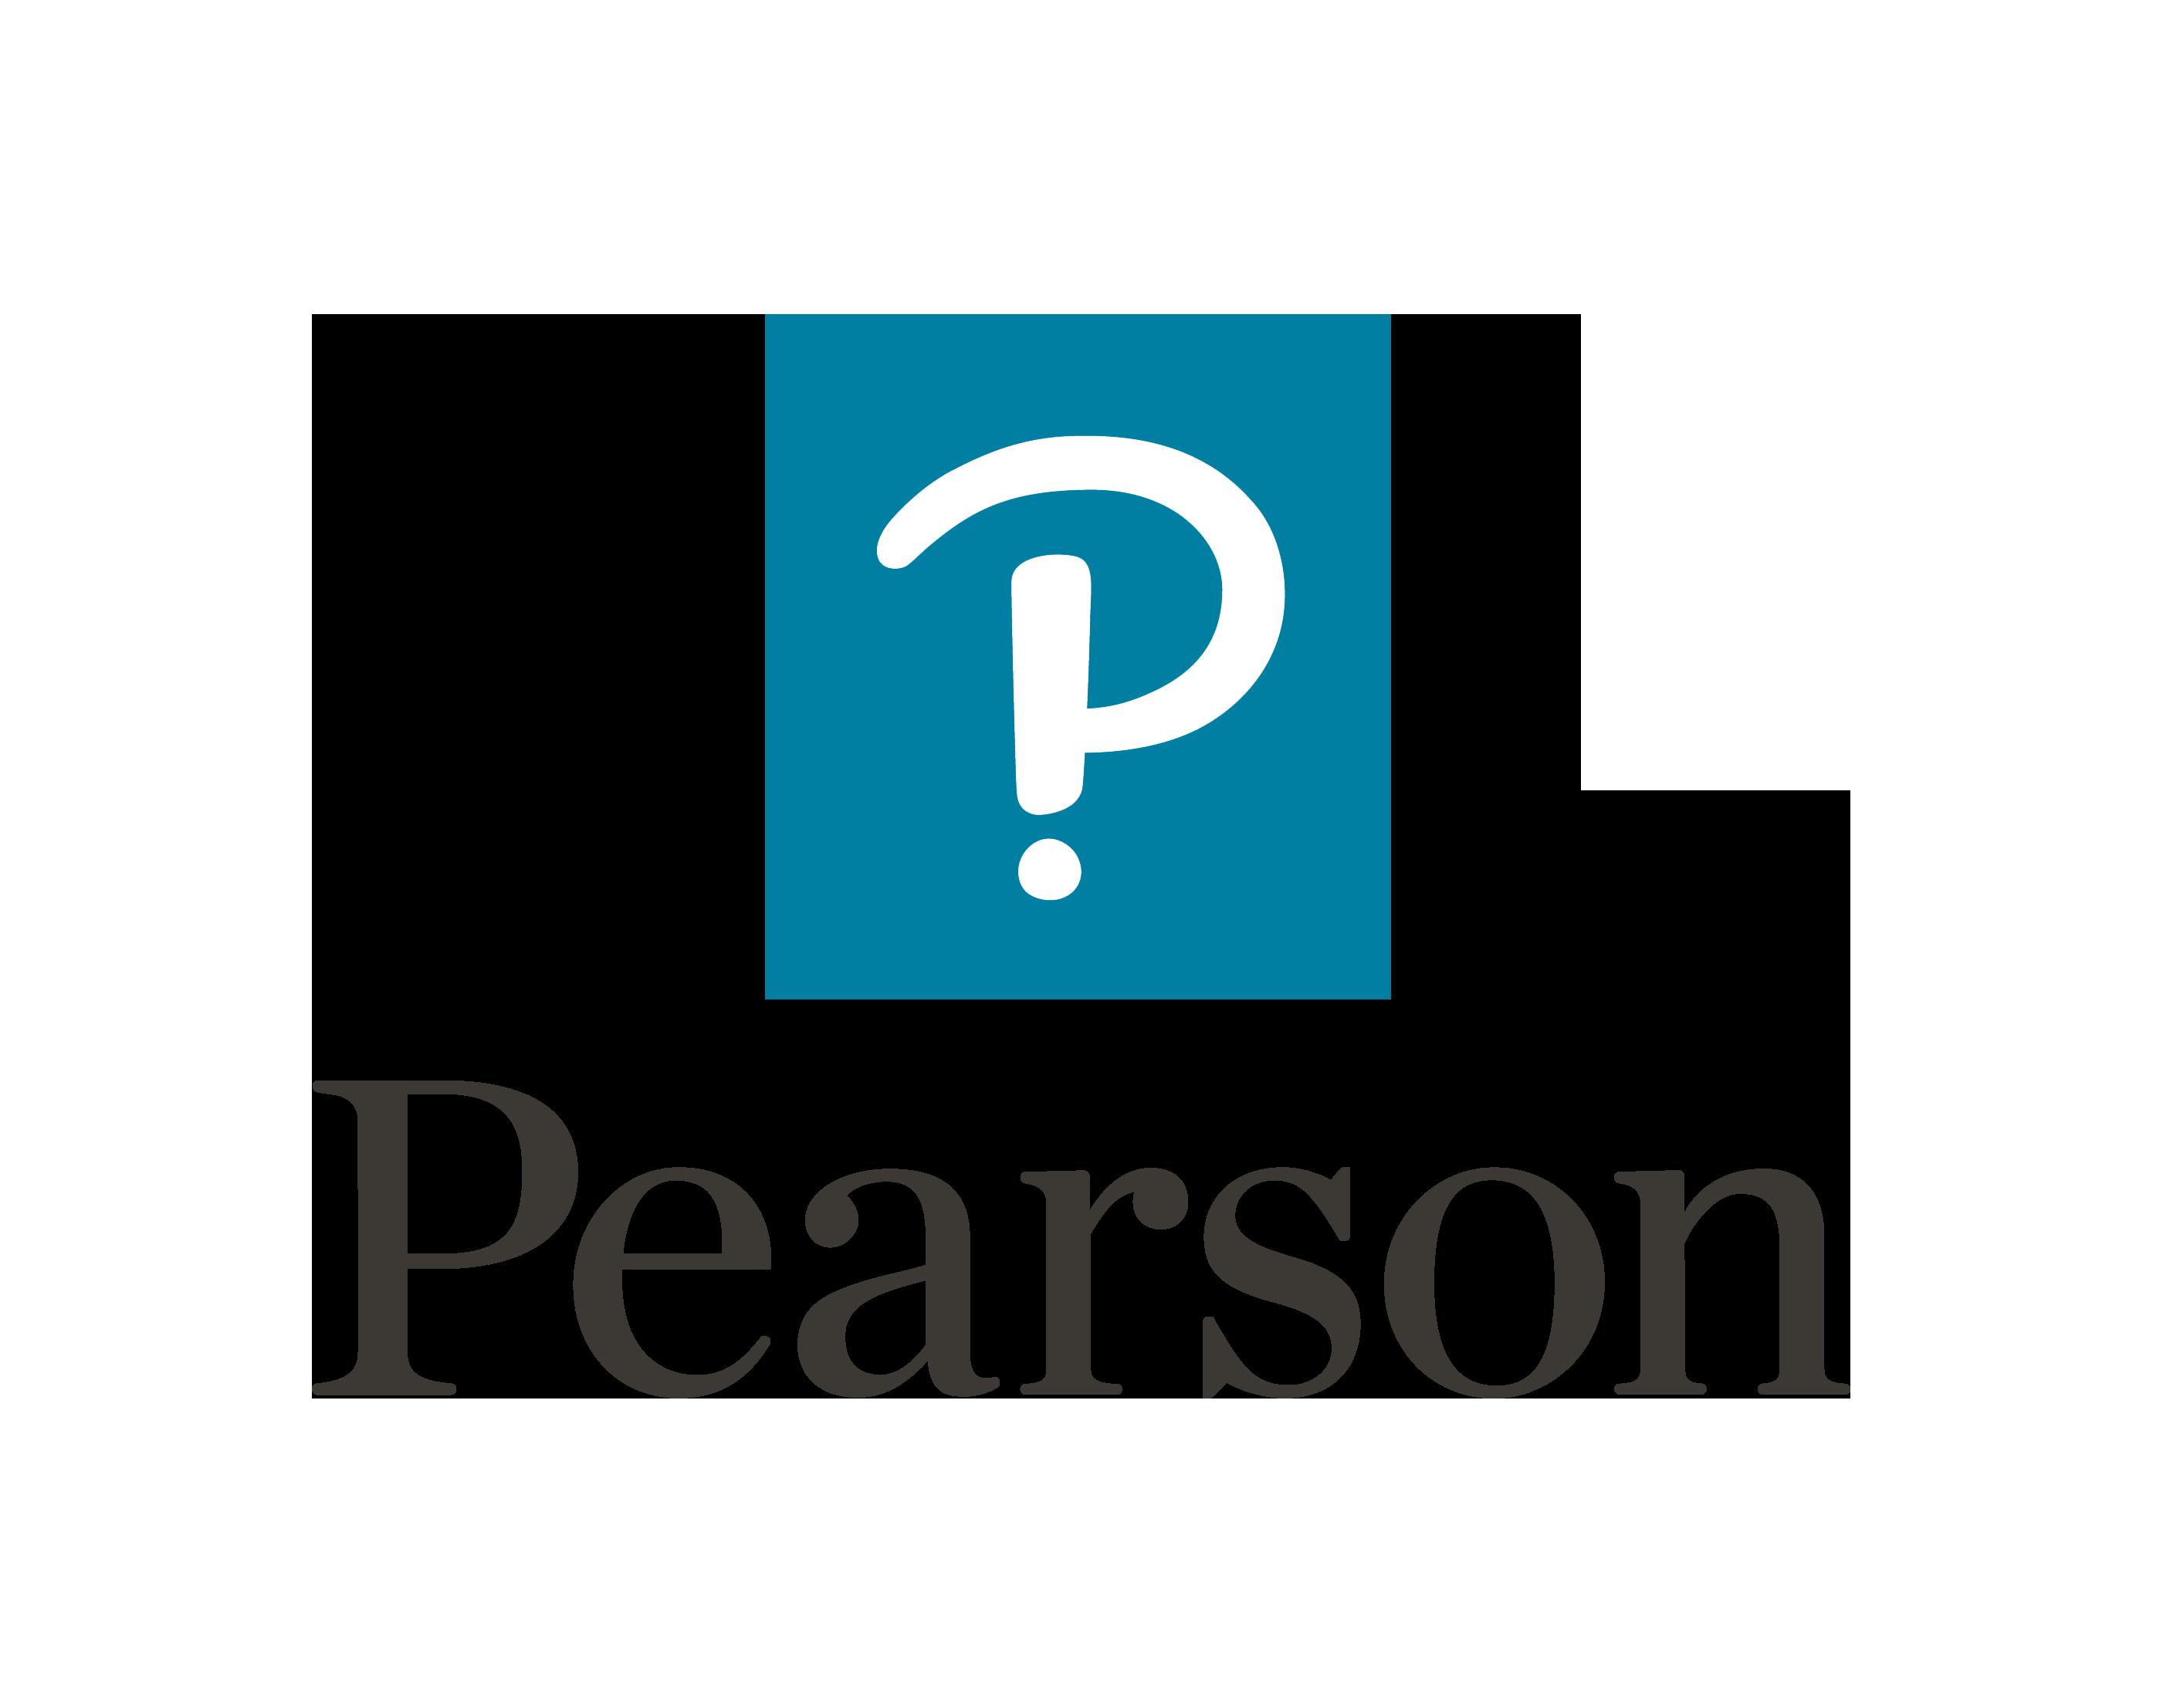 Pearson Logo Wallpaper